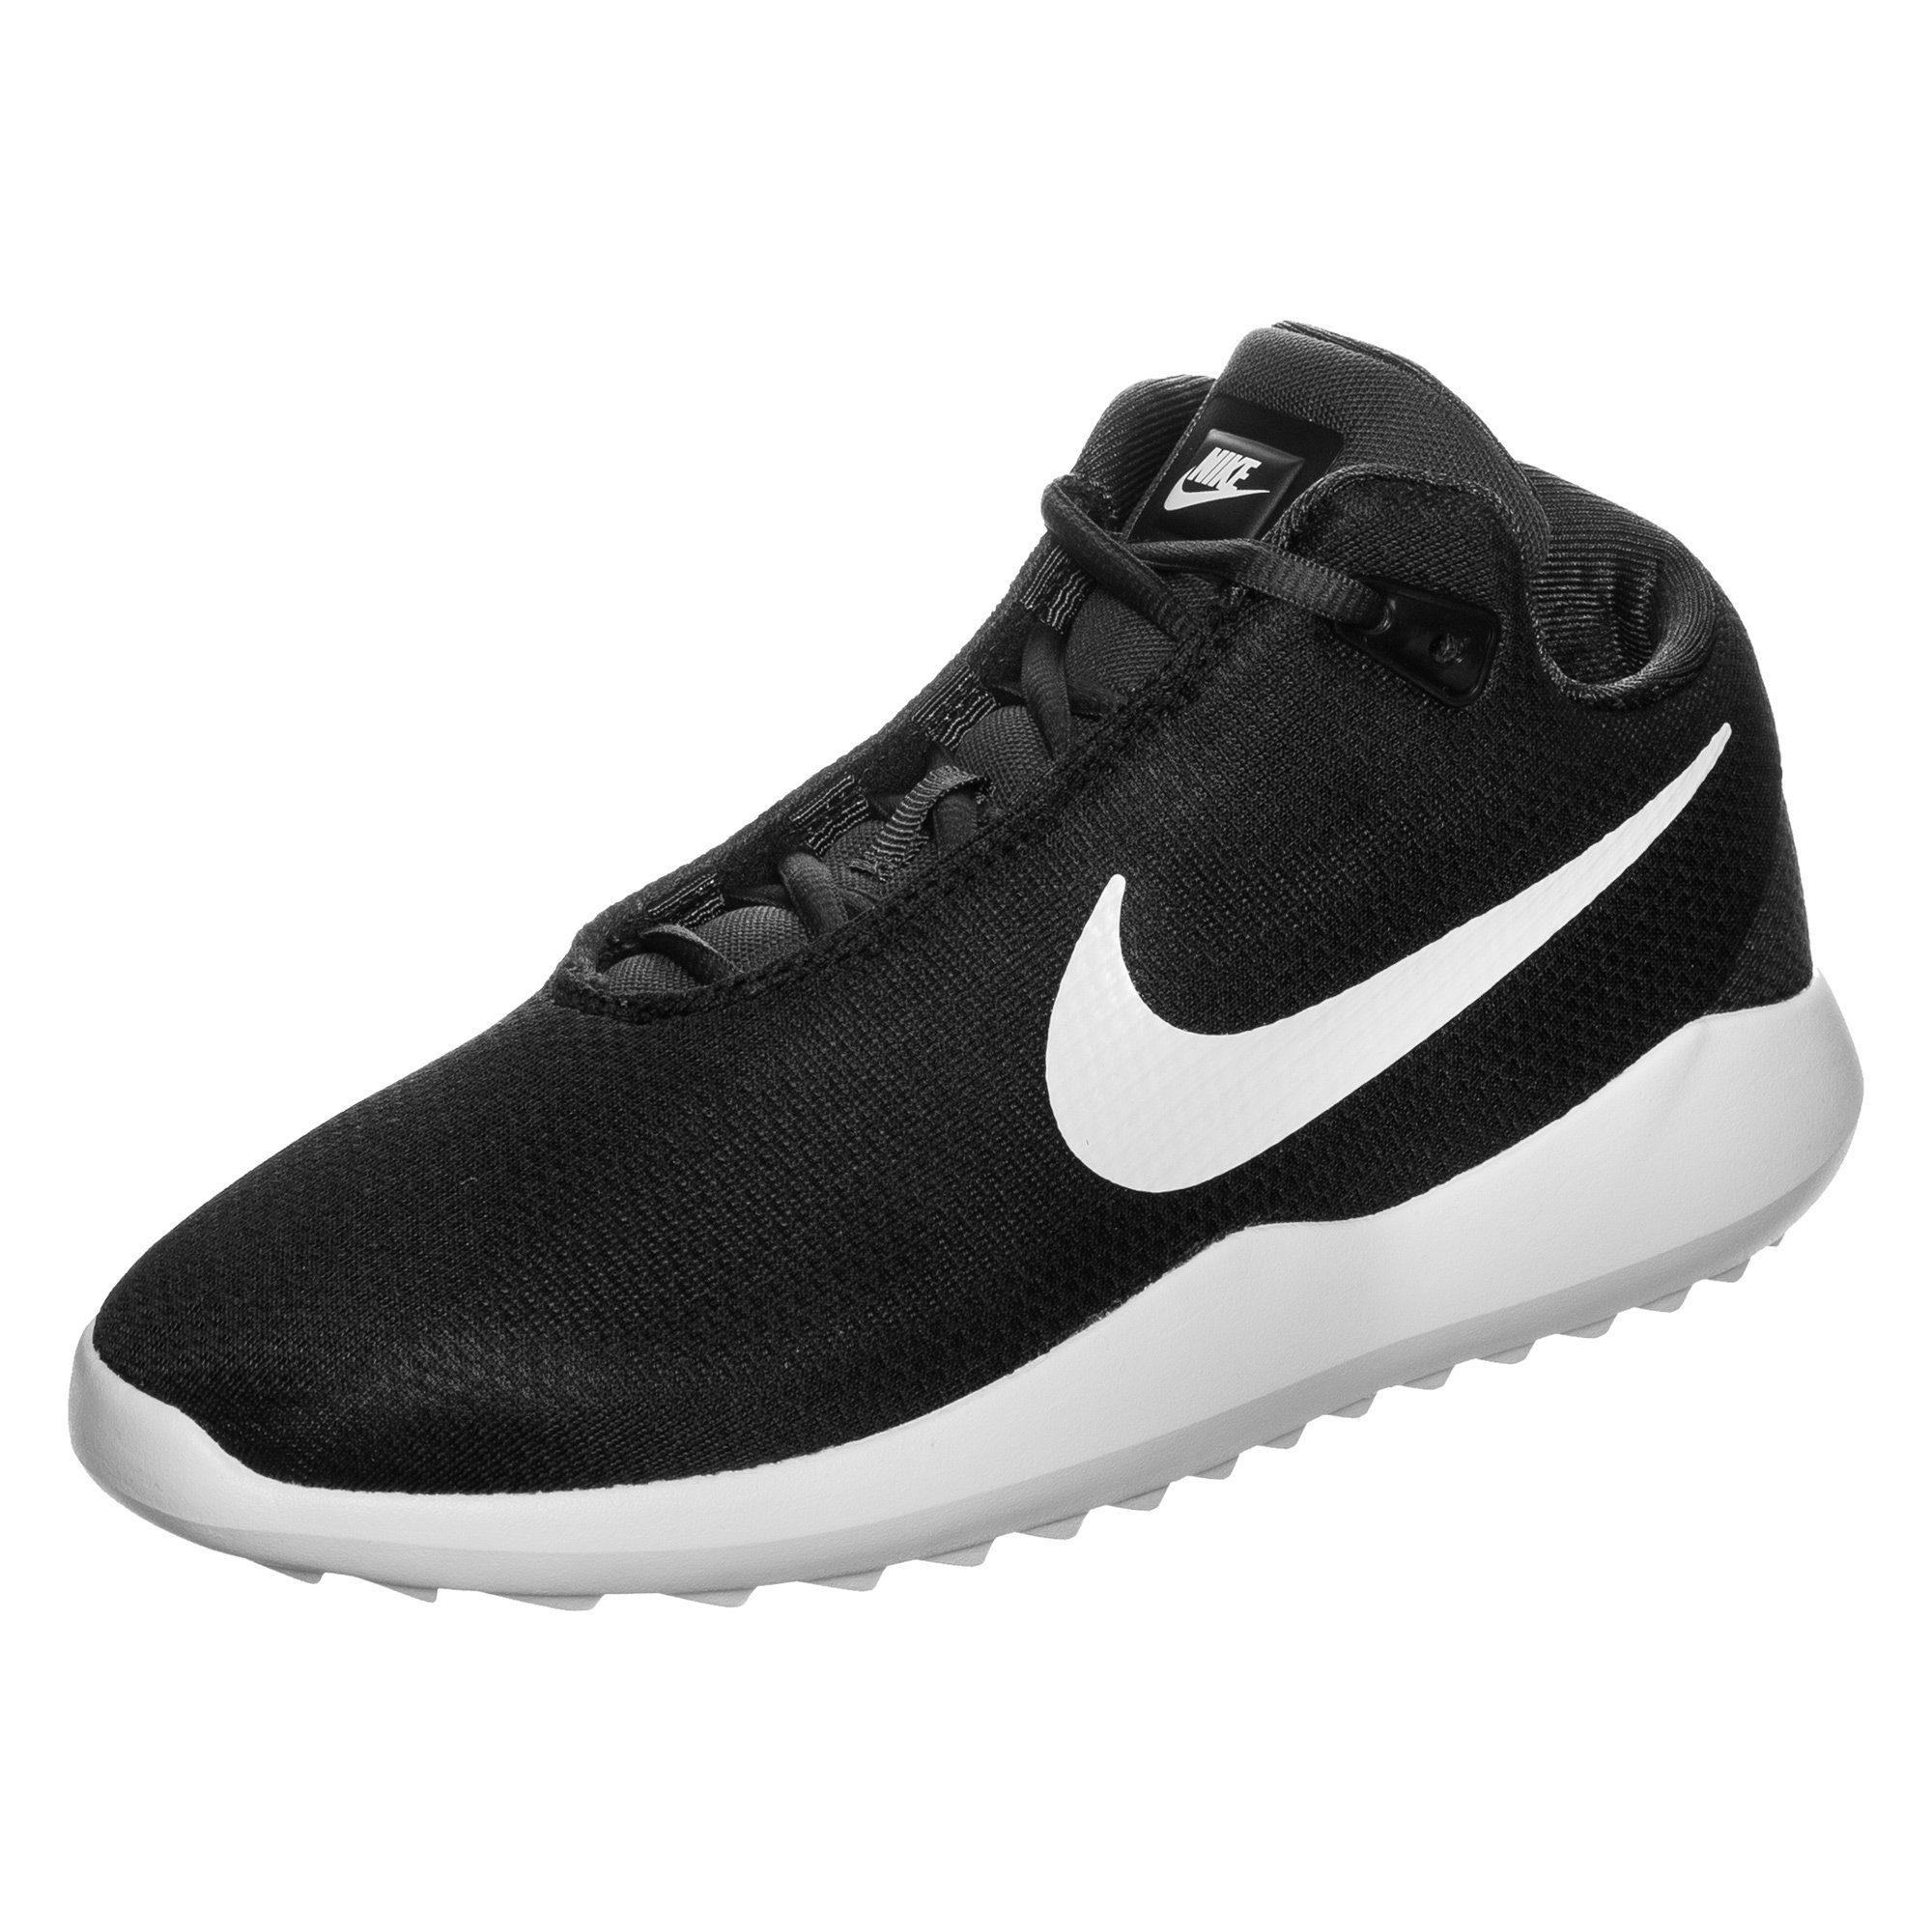 Nike Sportswear Jamaza Sneaker Damen online kaufen  schwarz #ft5_slash# weiß